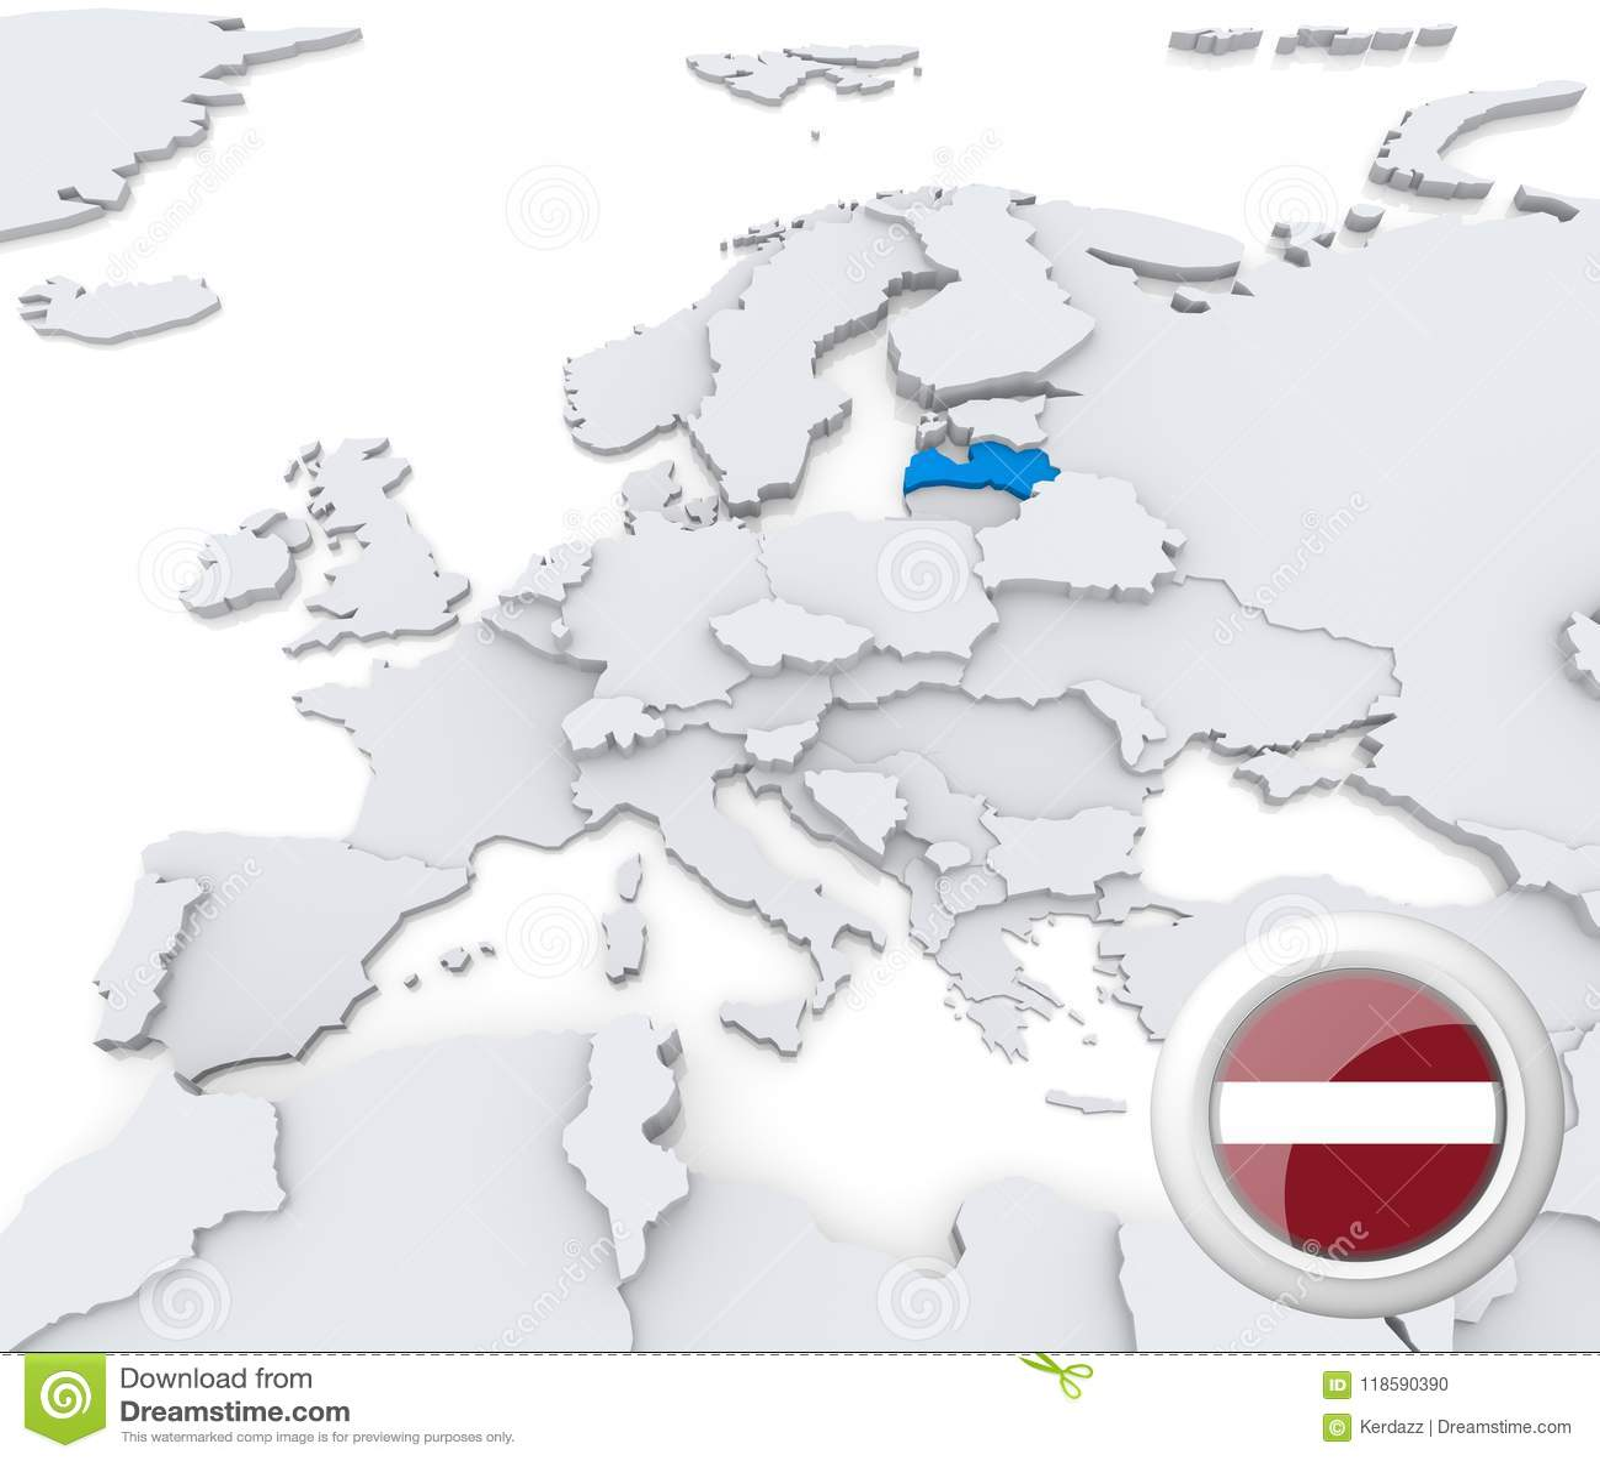 Latvia On Map Of Europe Stock Illustration Illustration Of Atlas 118590390